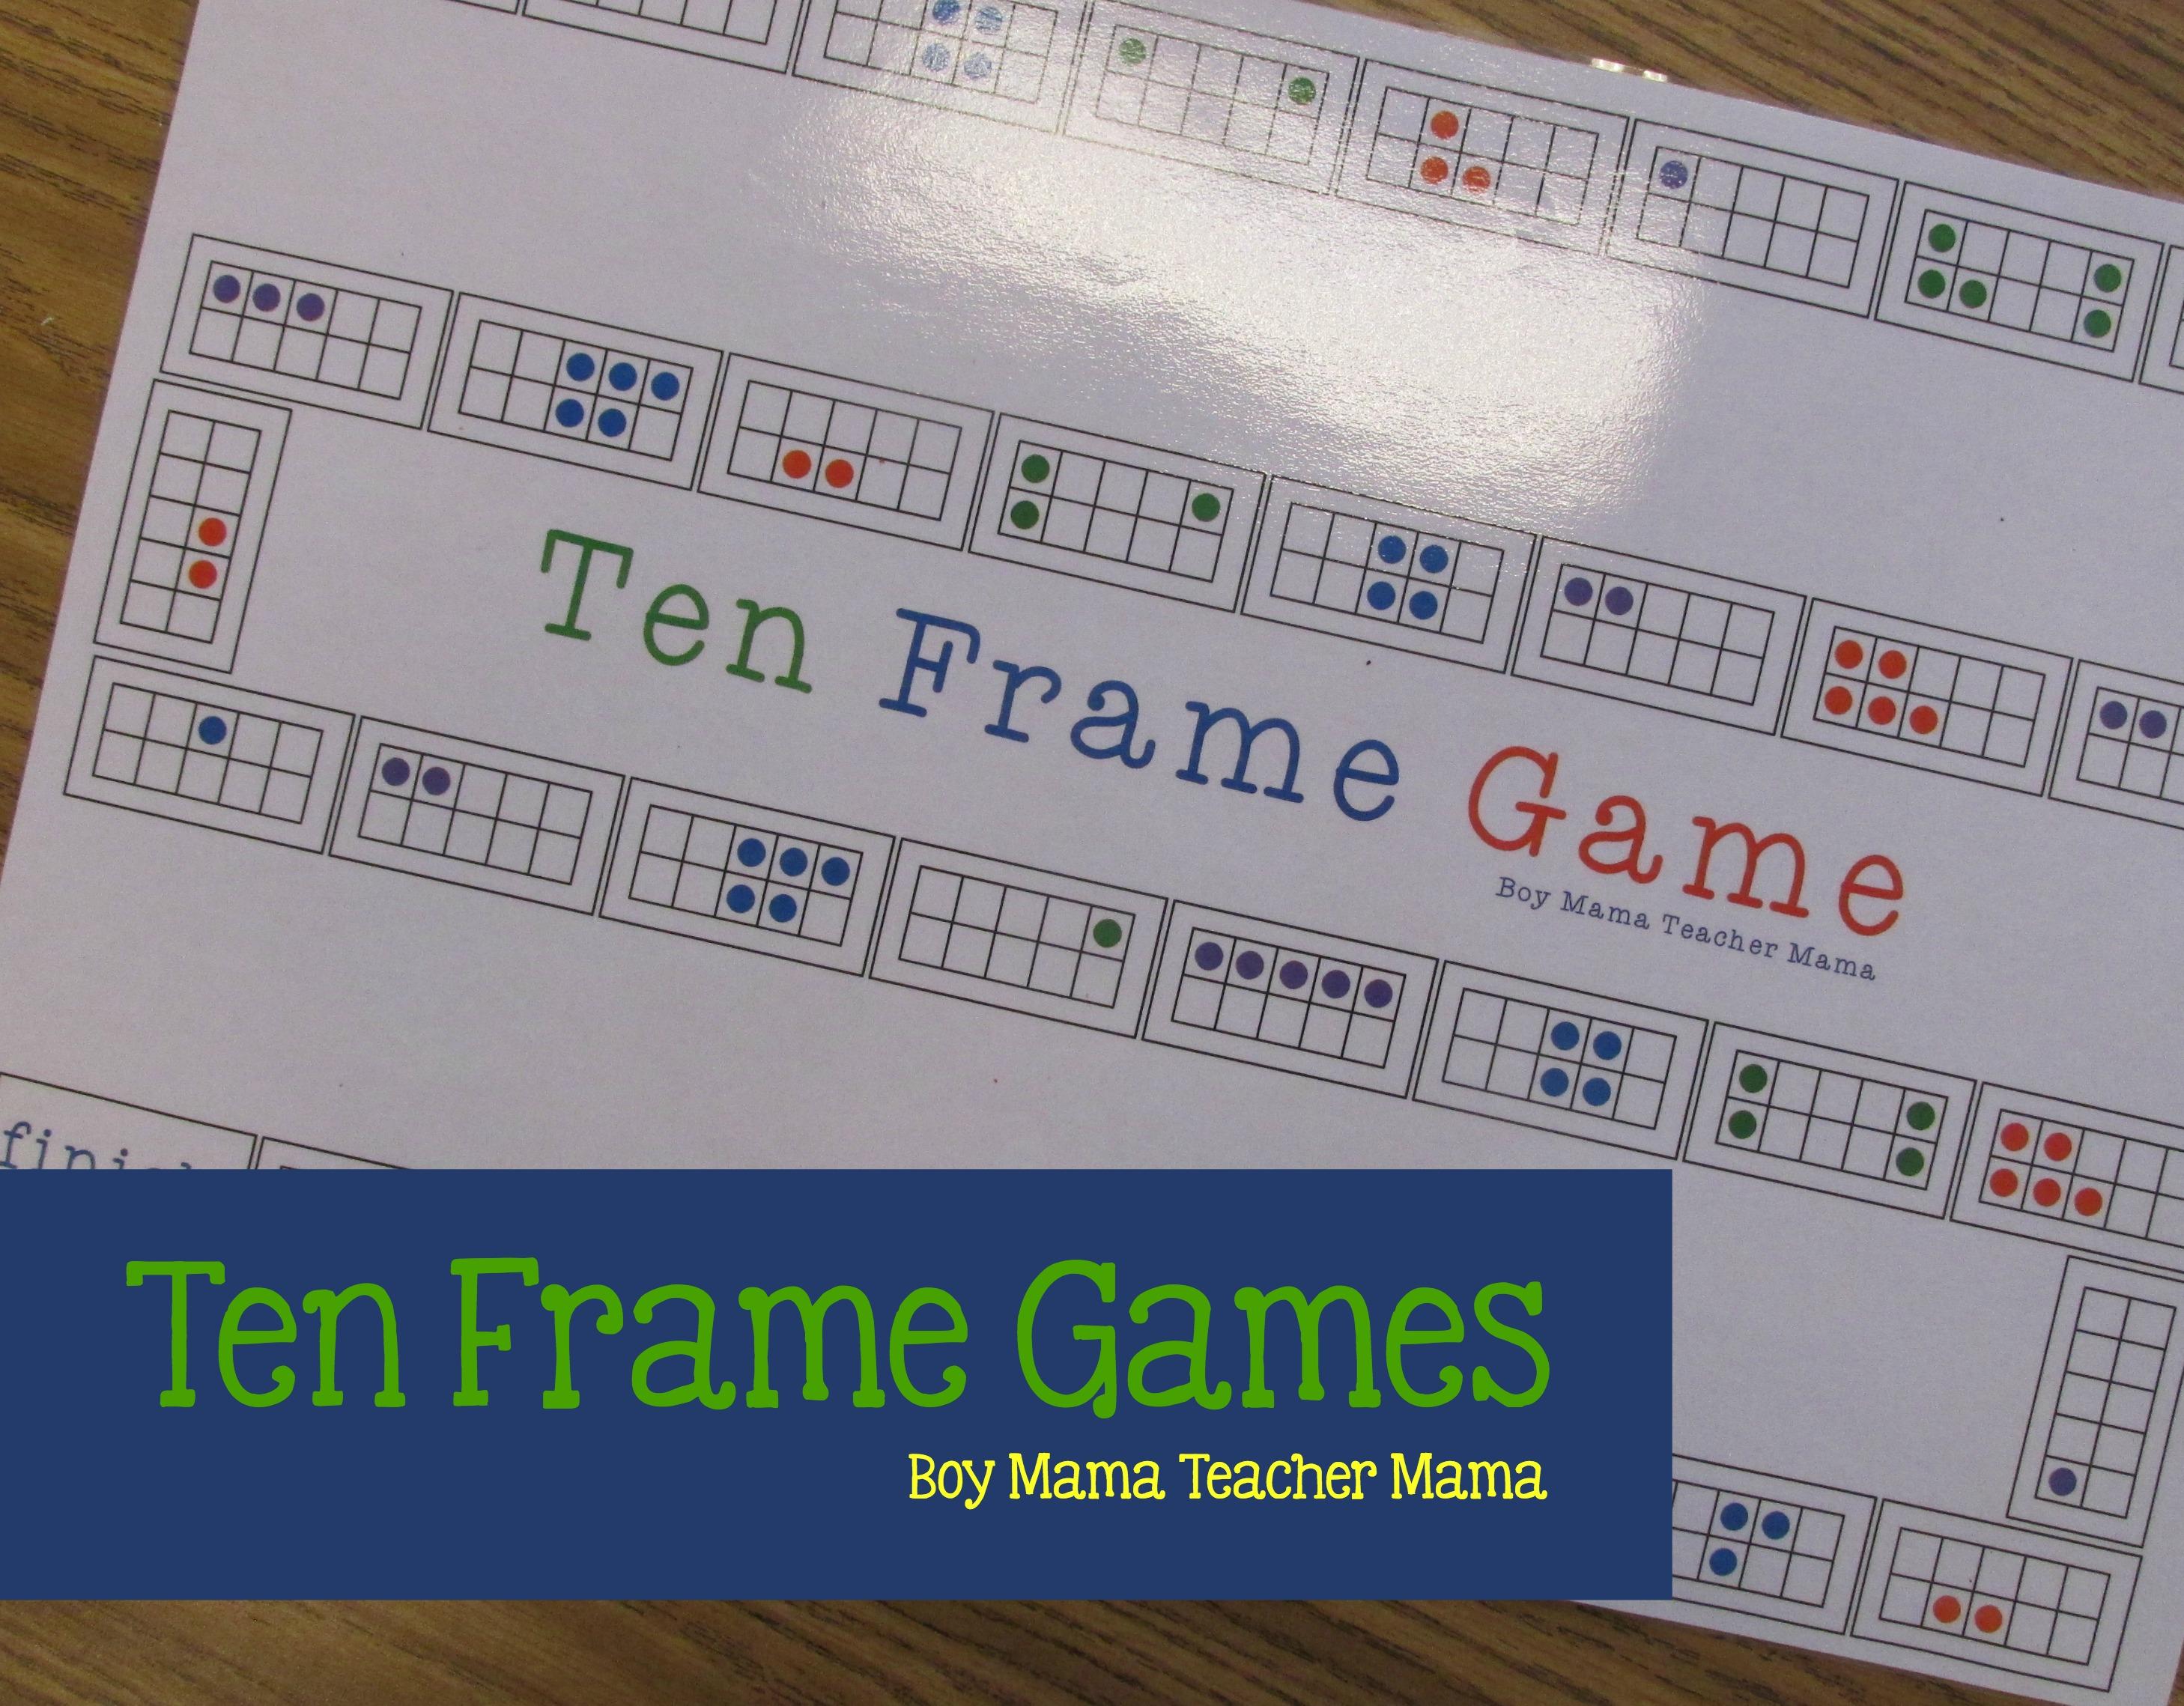 Boy Mama Teacher Mama Ten Frame Games